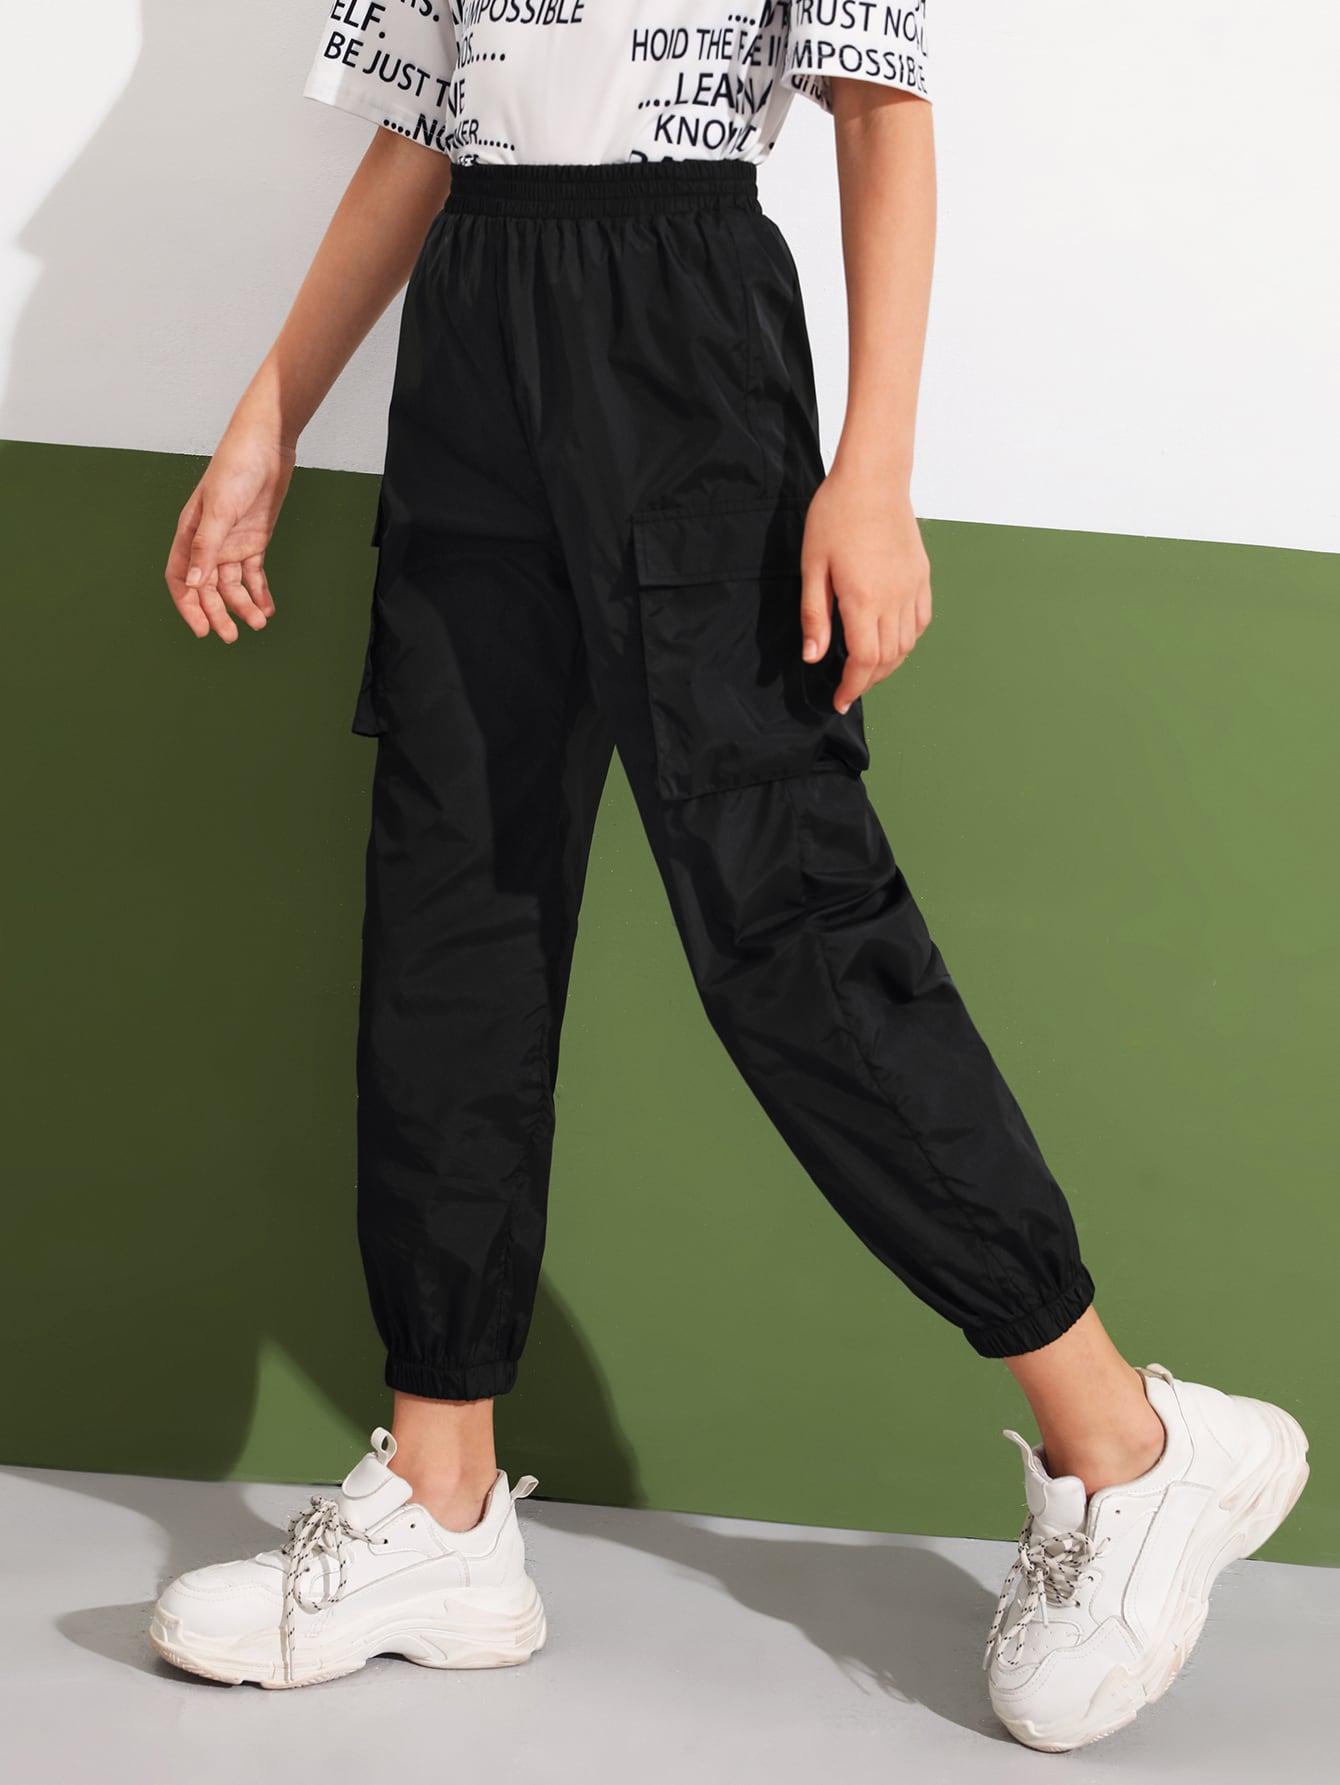 Girls Flap Pocket Patched Wind Pants